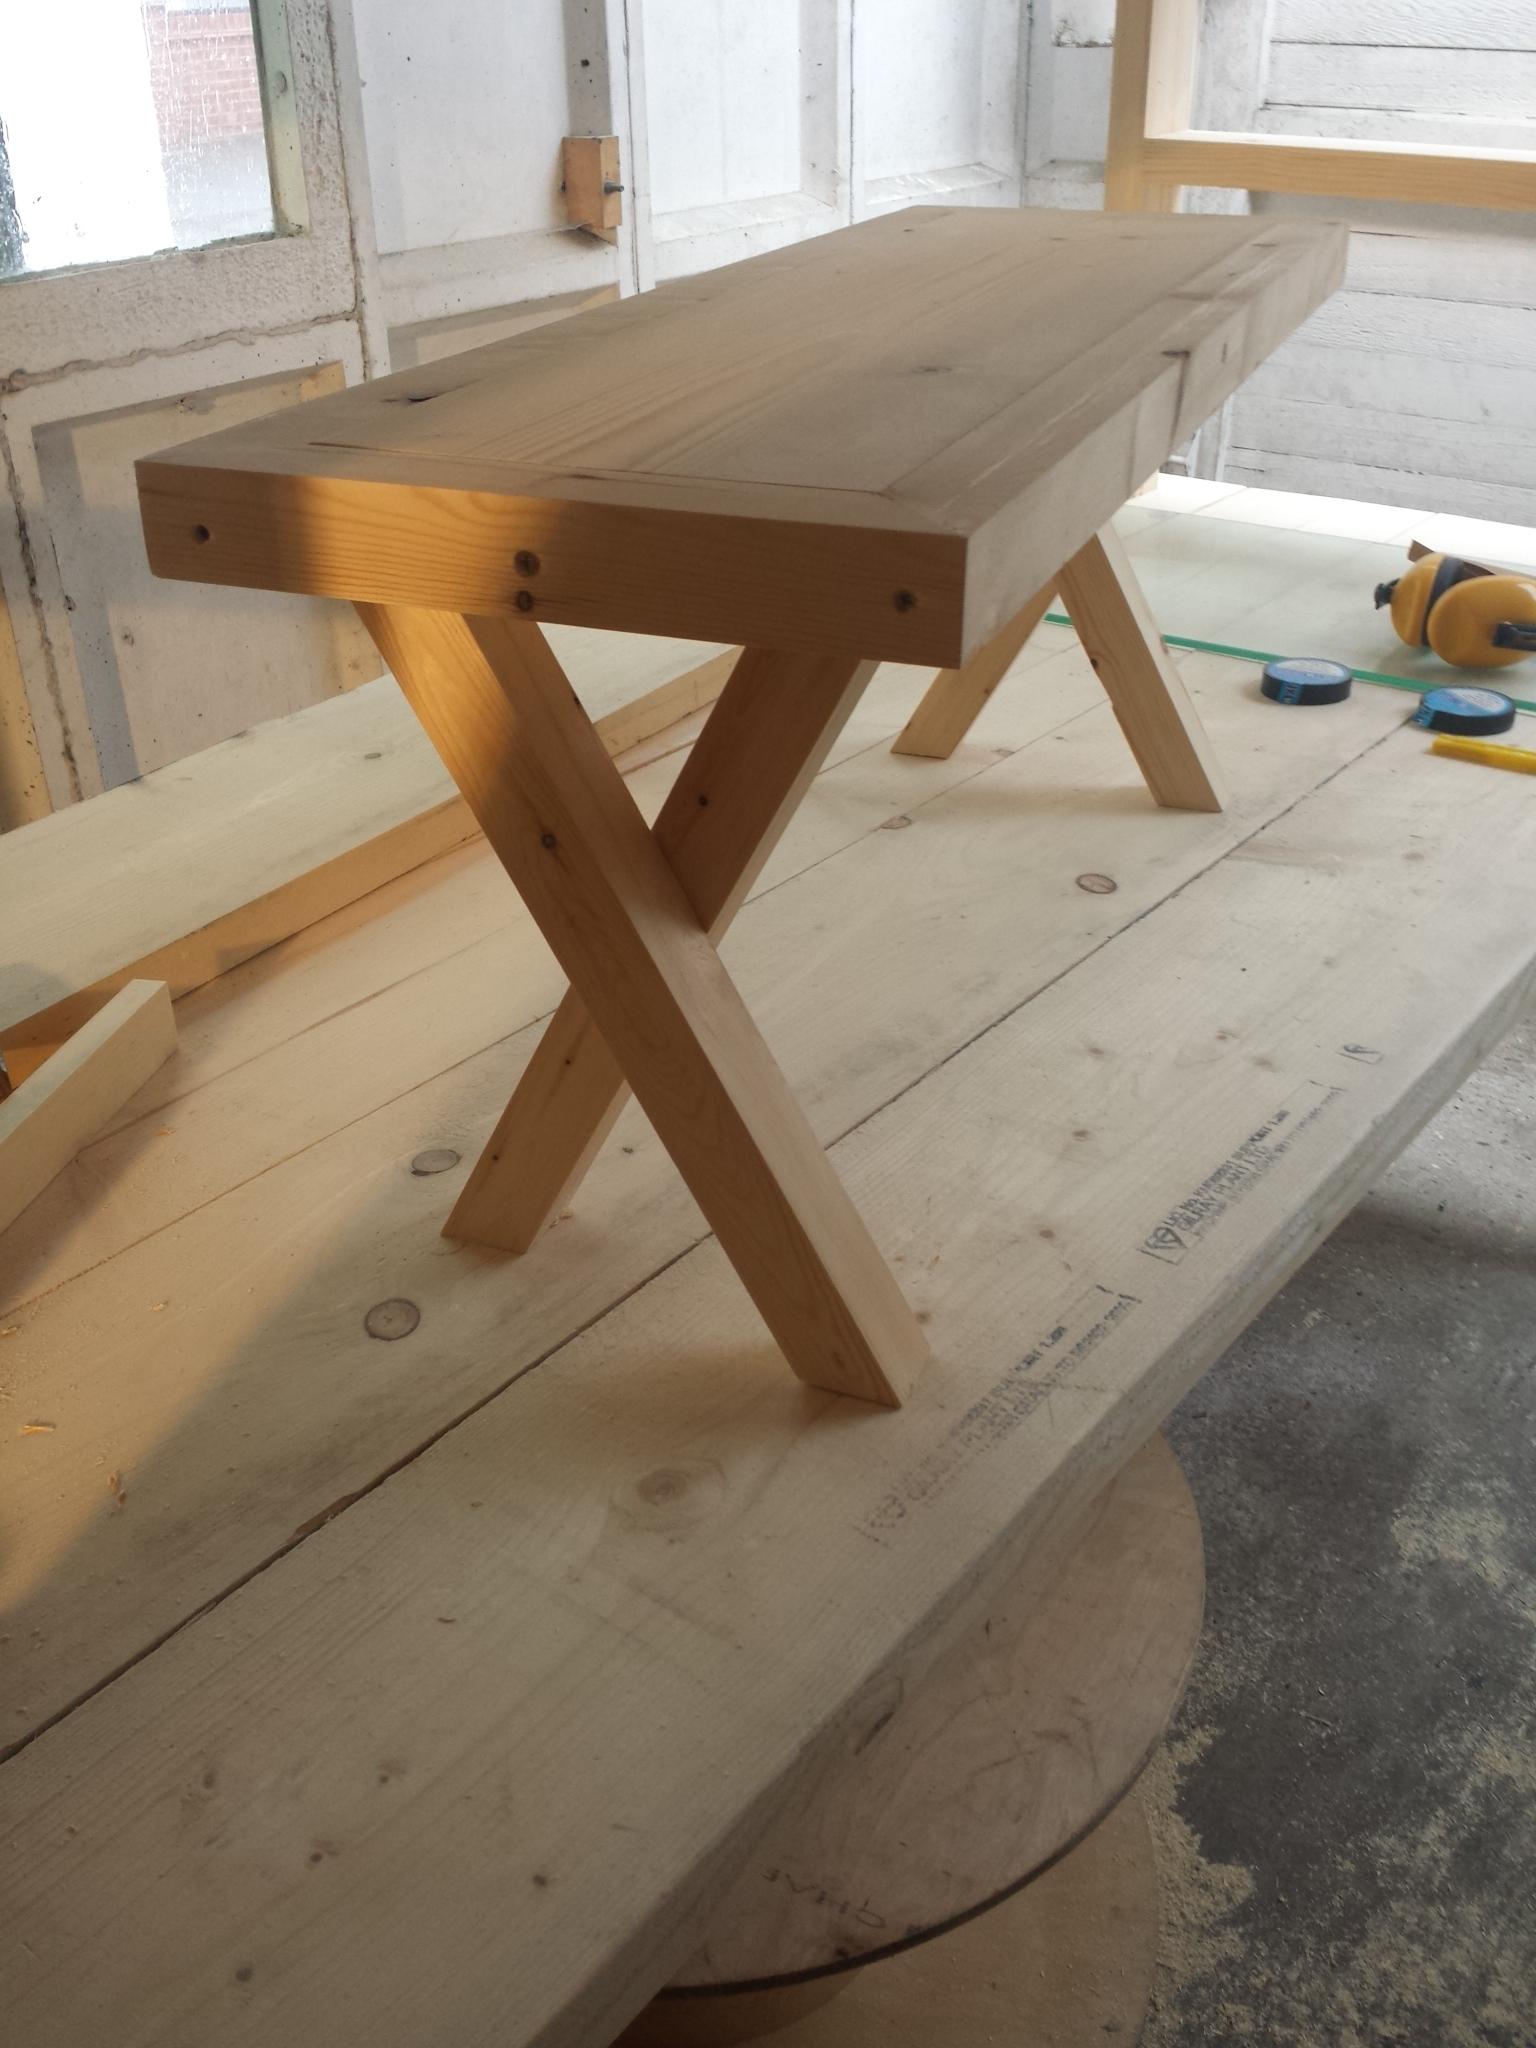 criss cross very woody things